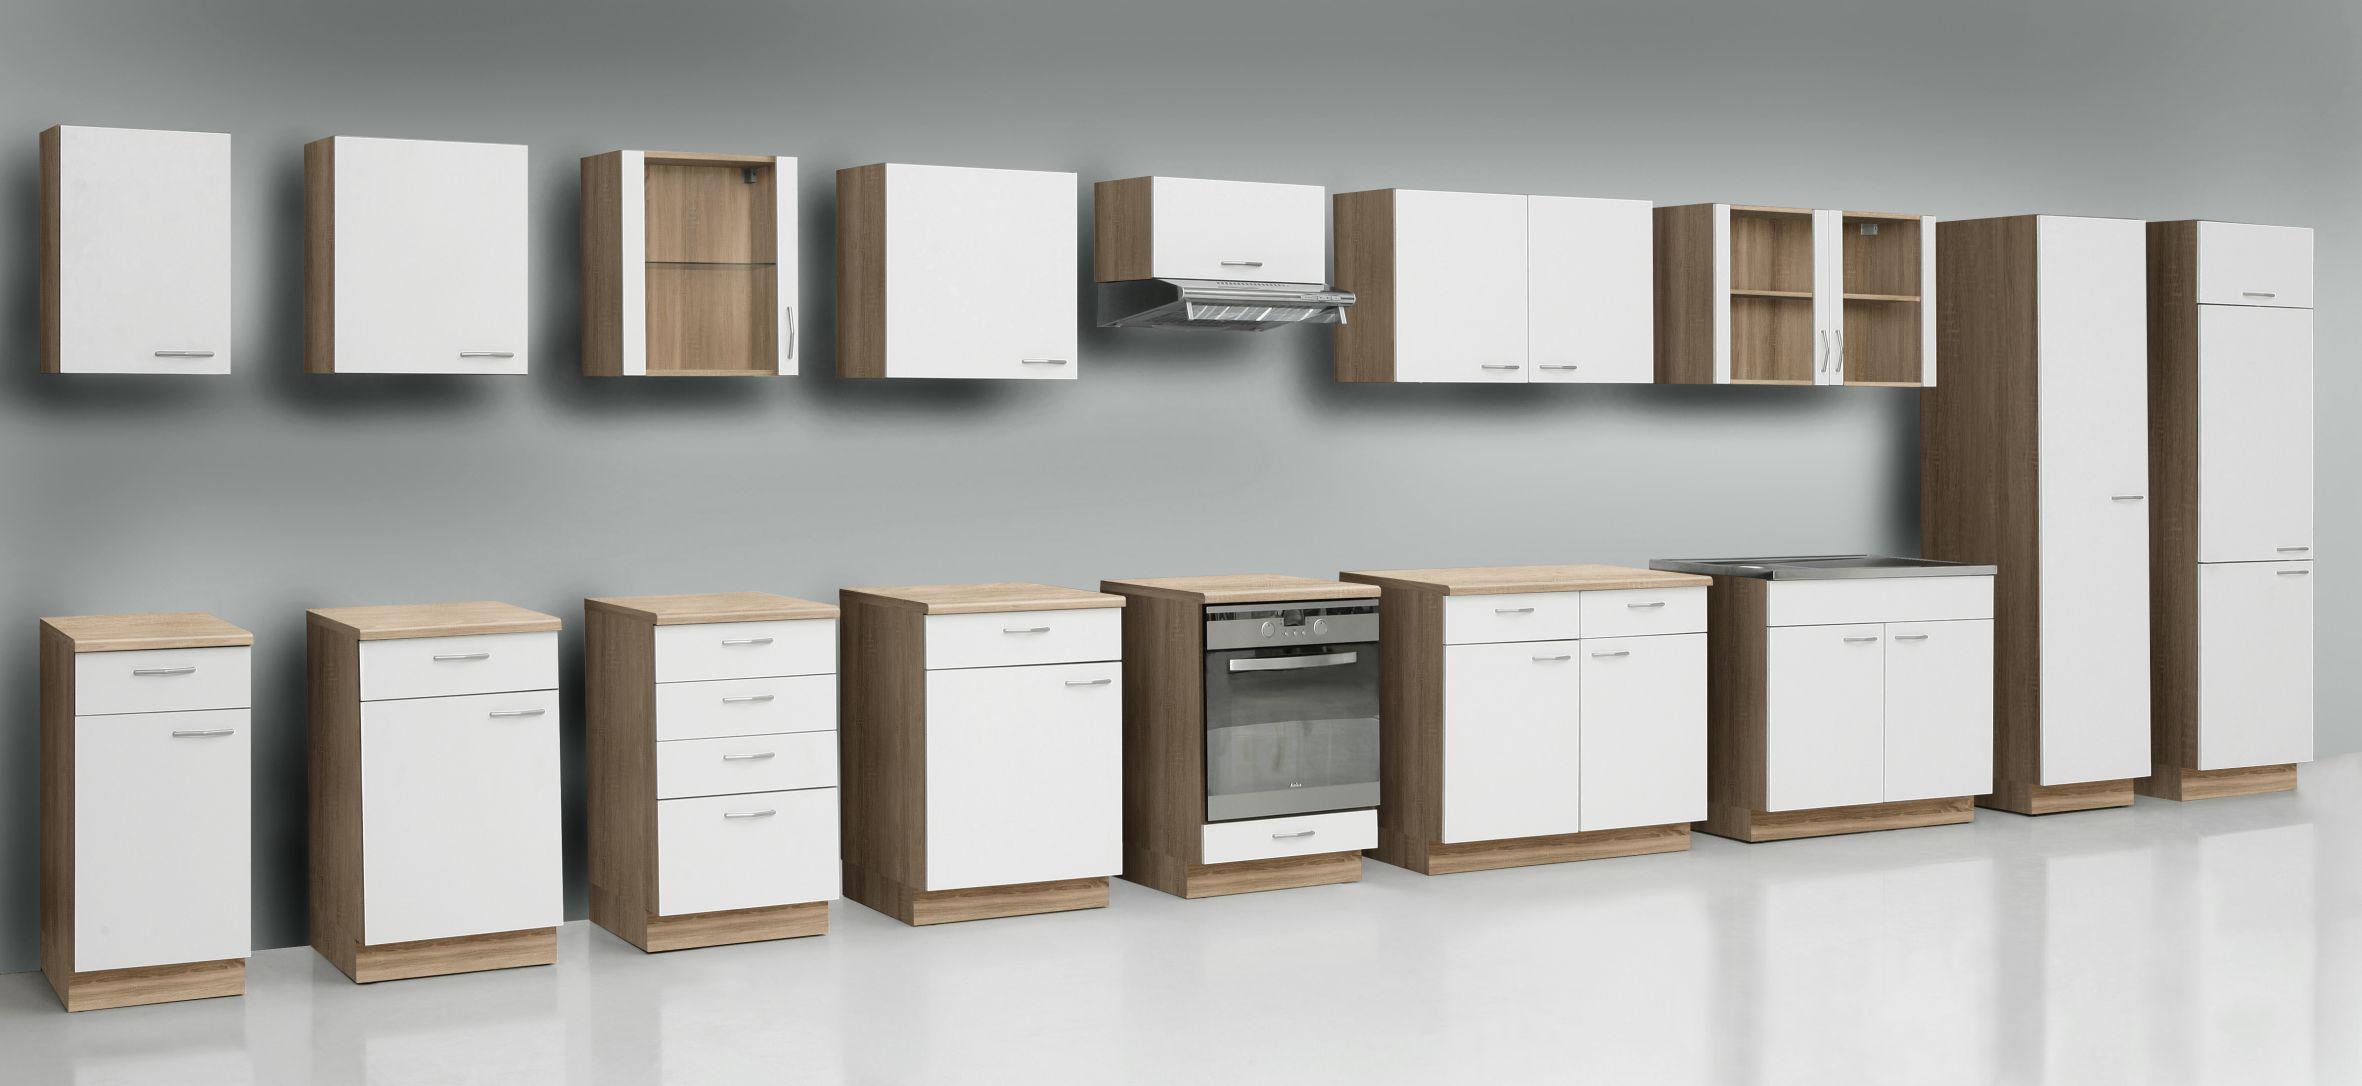 classico k che h ngeschrank 2 t rig. Black Bedroom Furniture Sets. Home Design Ideas